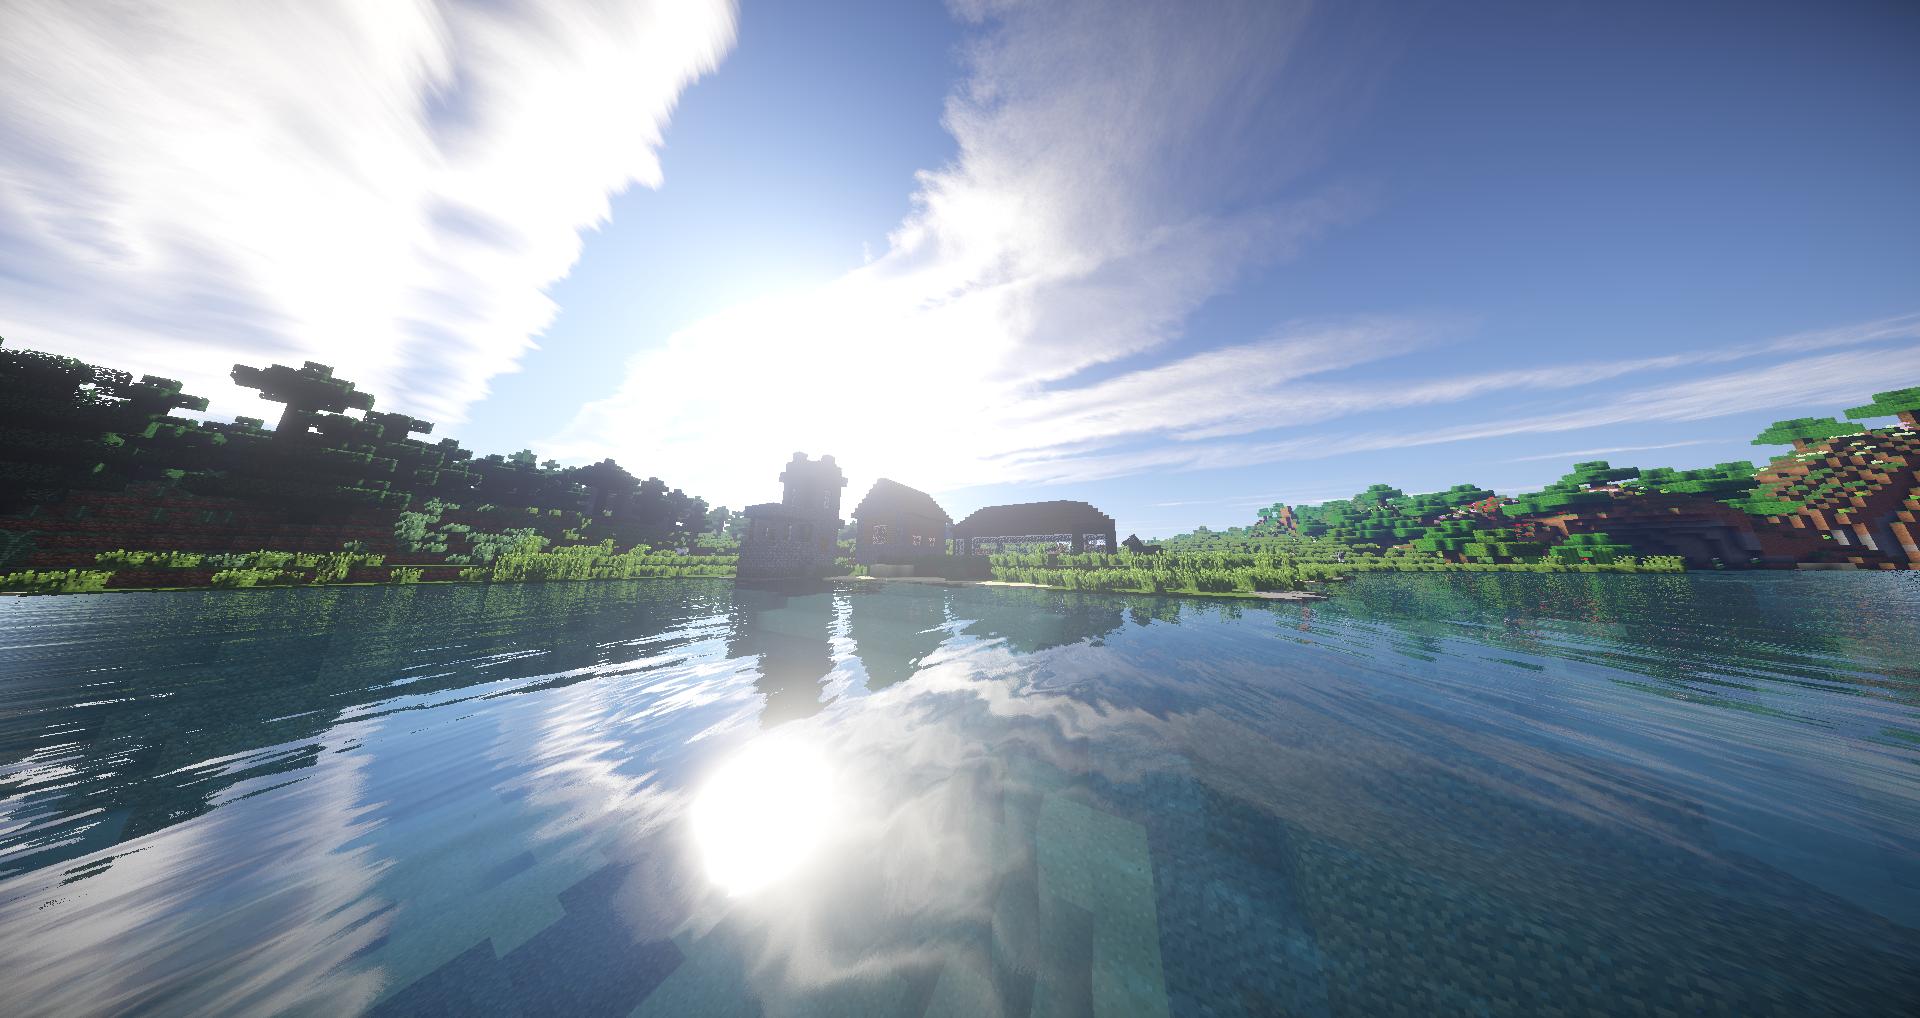 Download Herobrine Mod for Minecraft 1.4.5 (With images